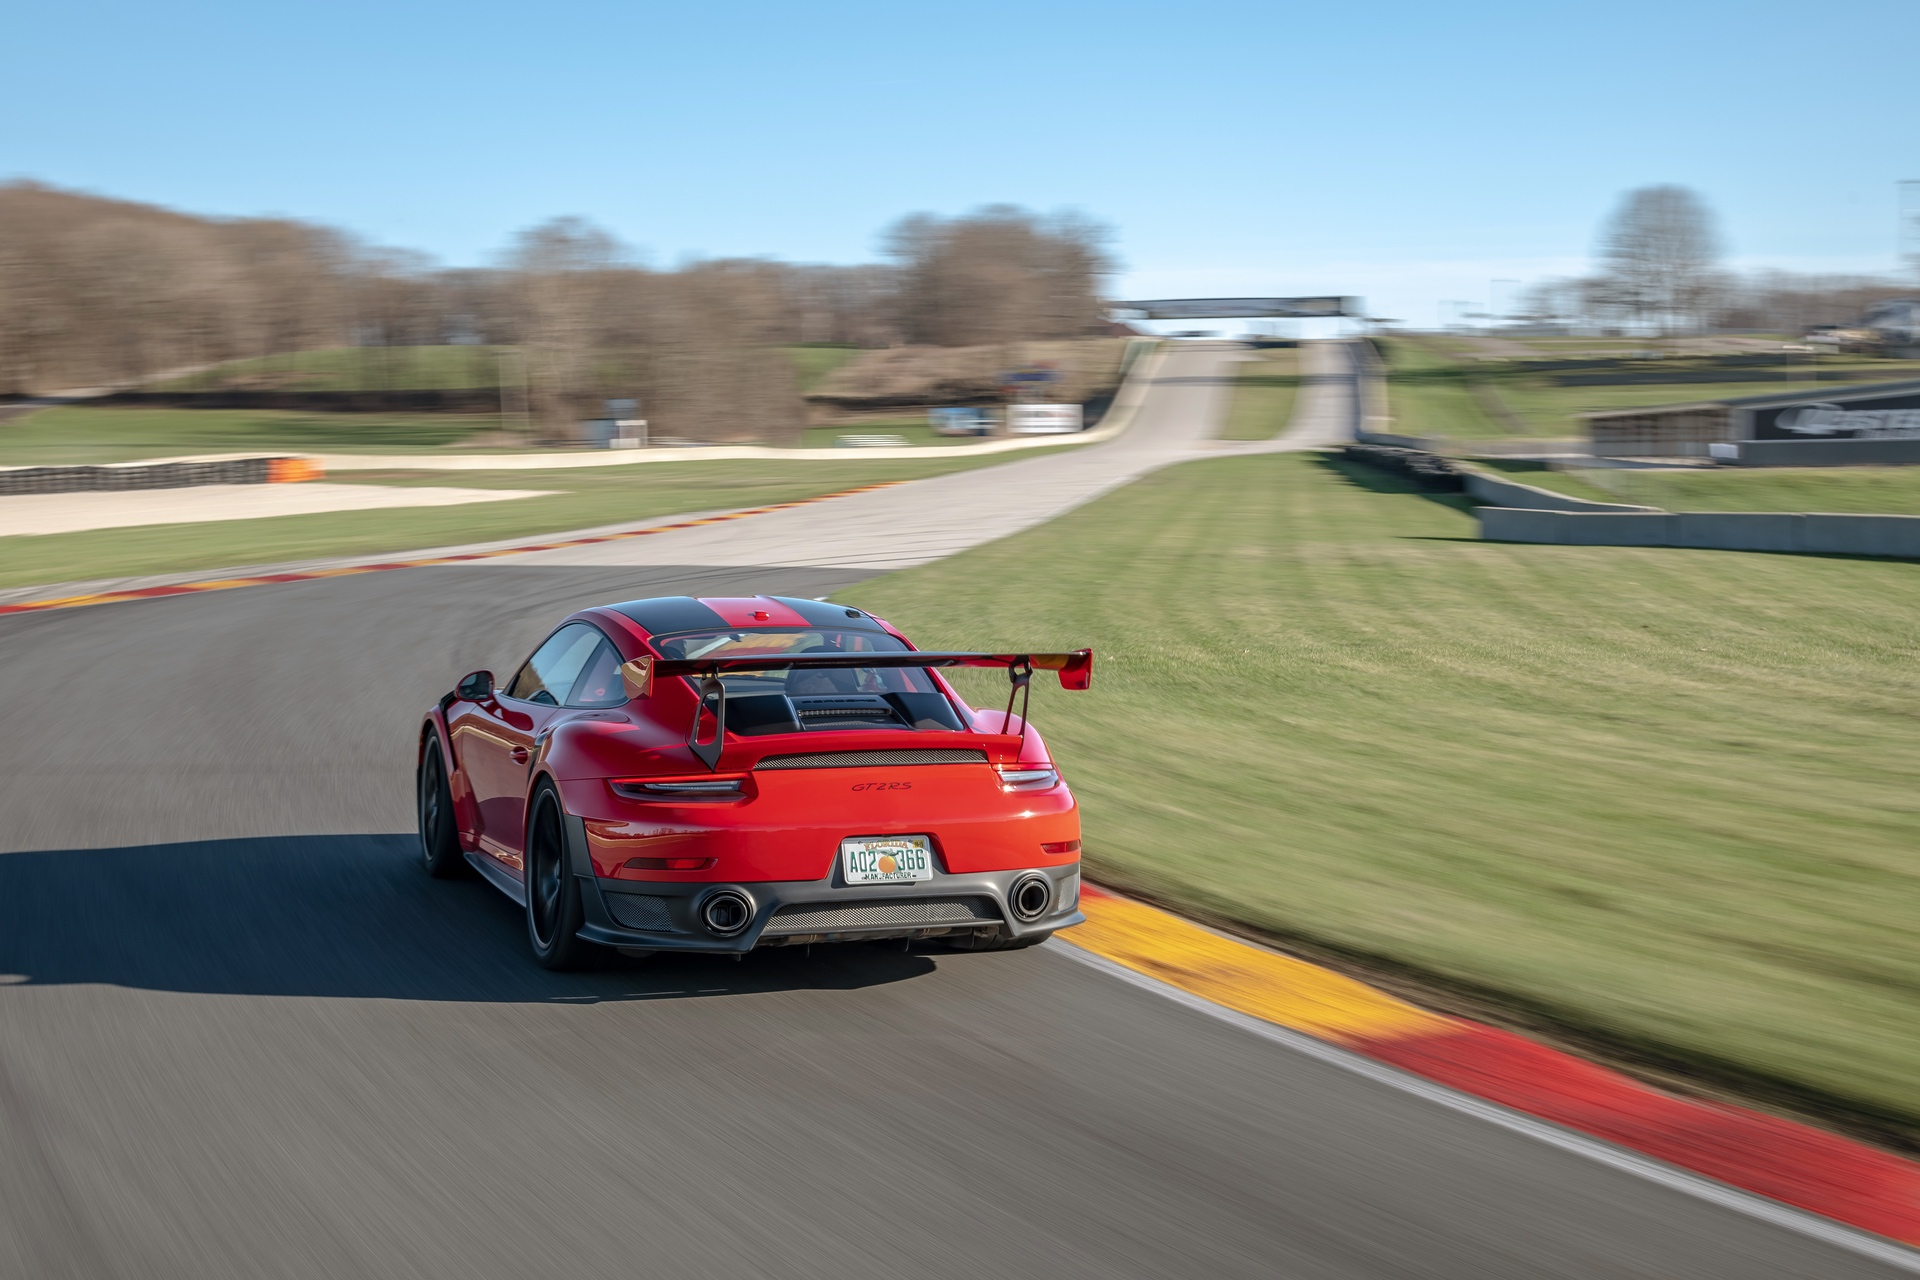 Porsche_911_GT2_RS_Road_America_0002